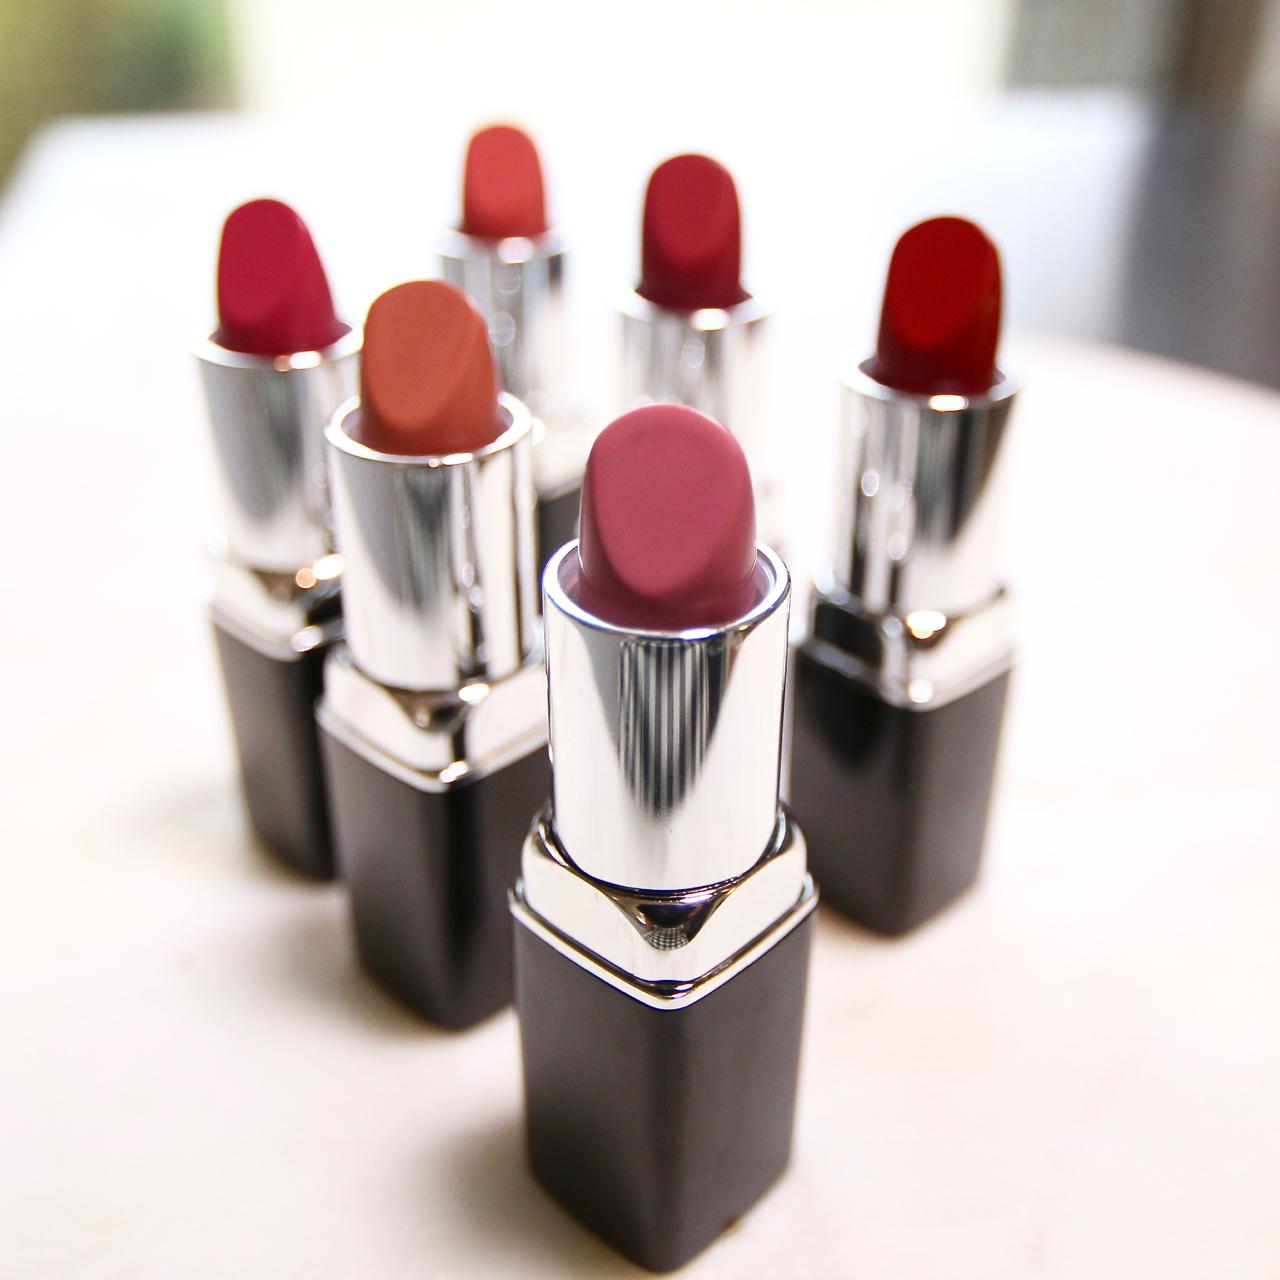 open lipstick tubes